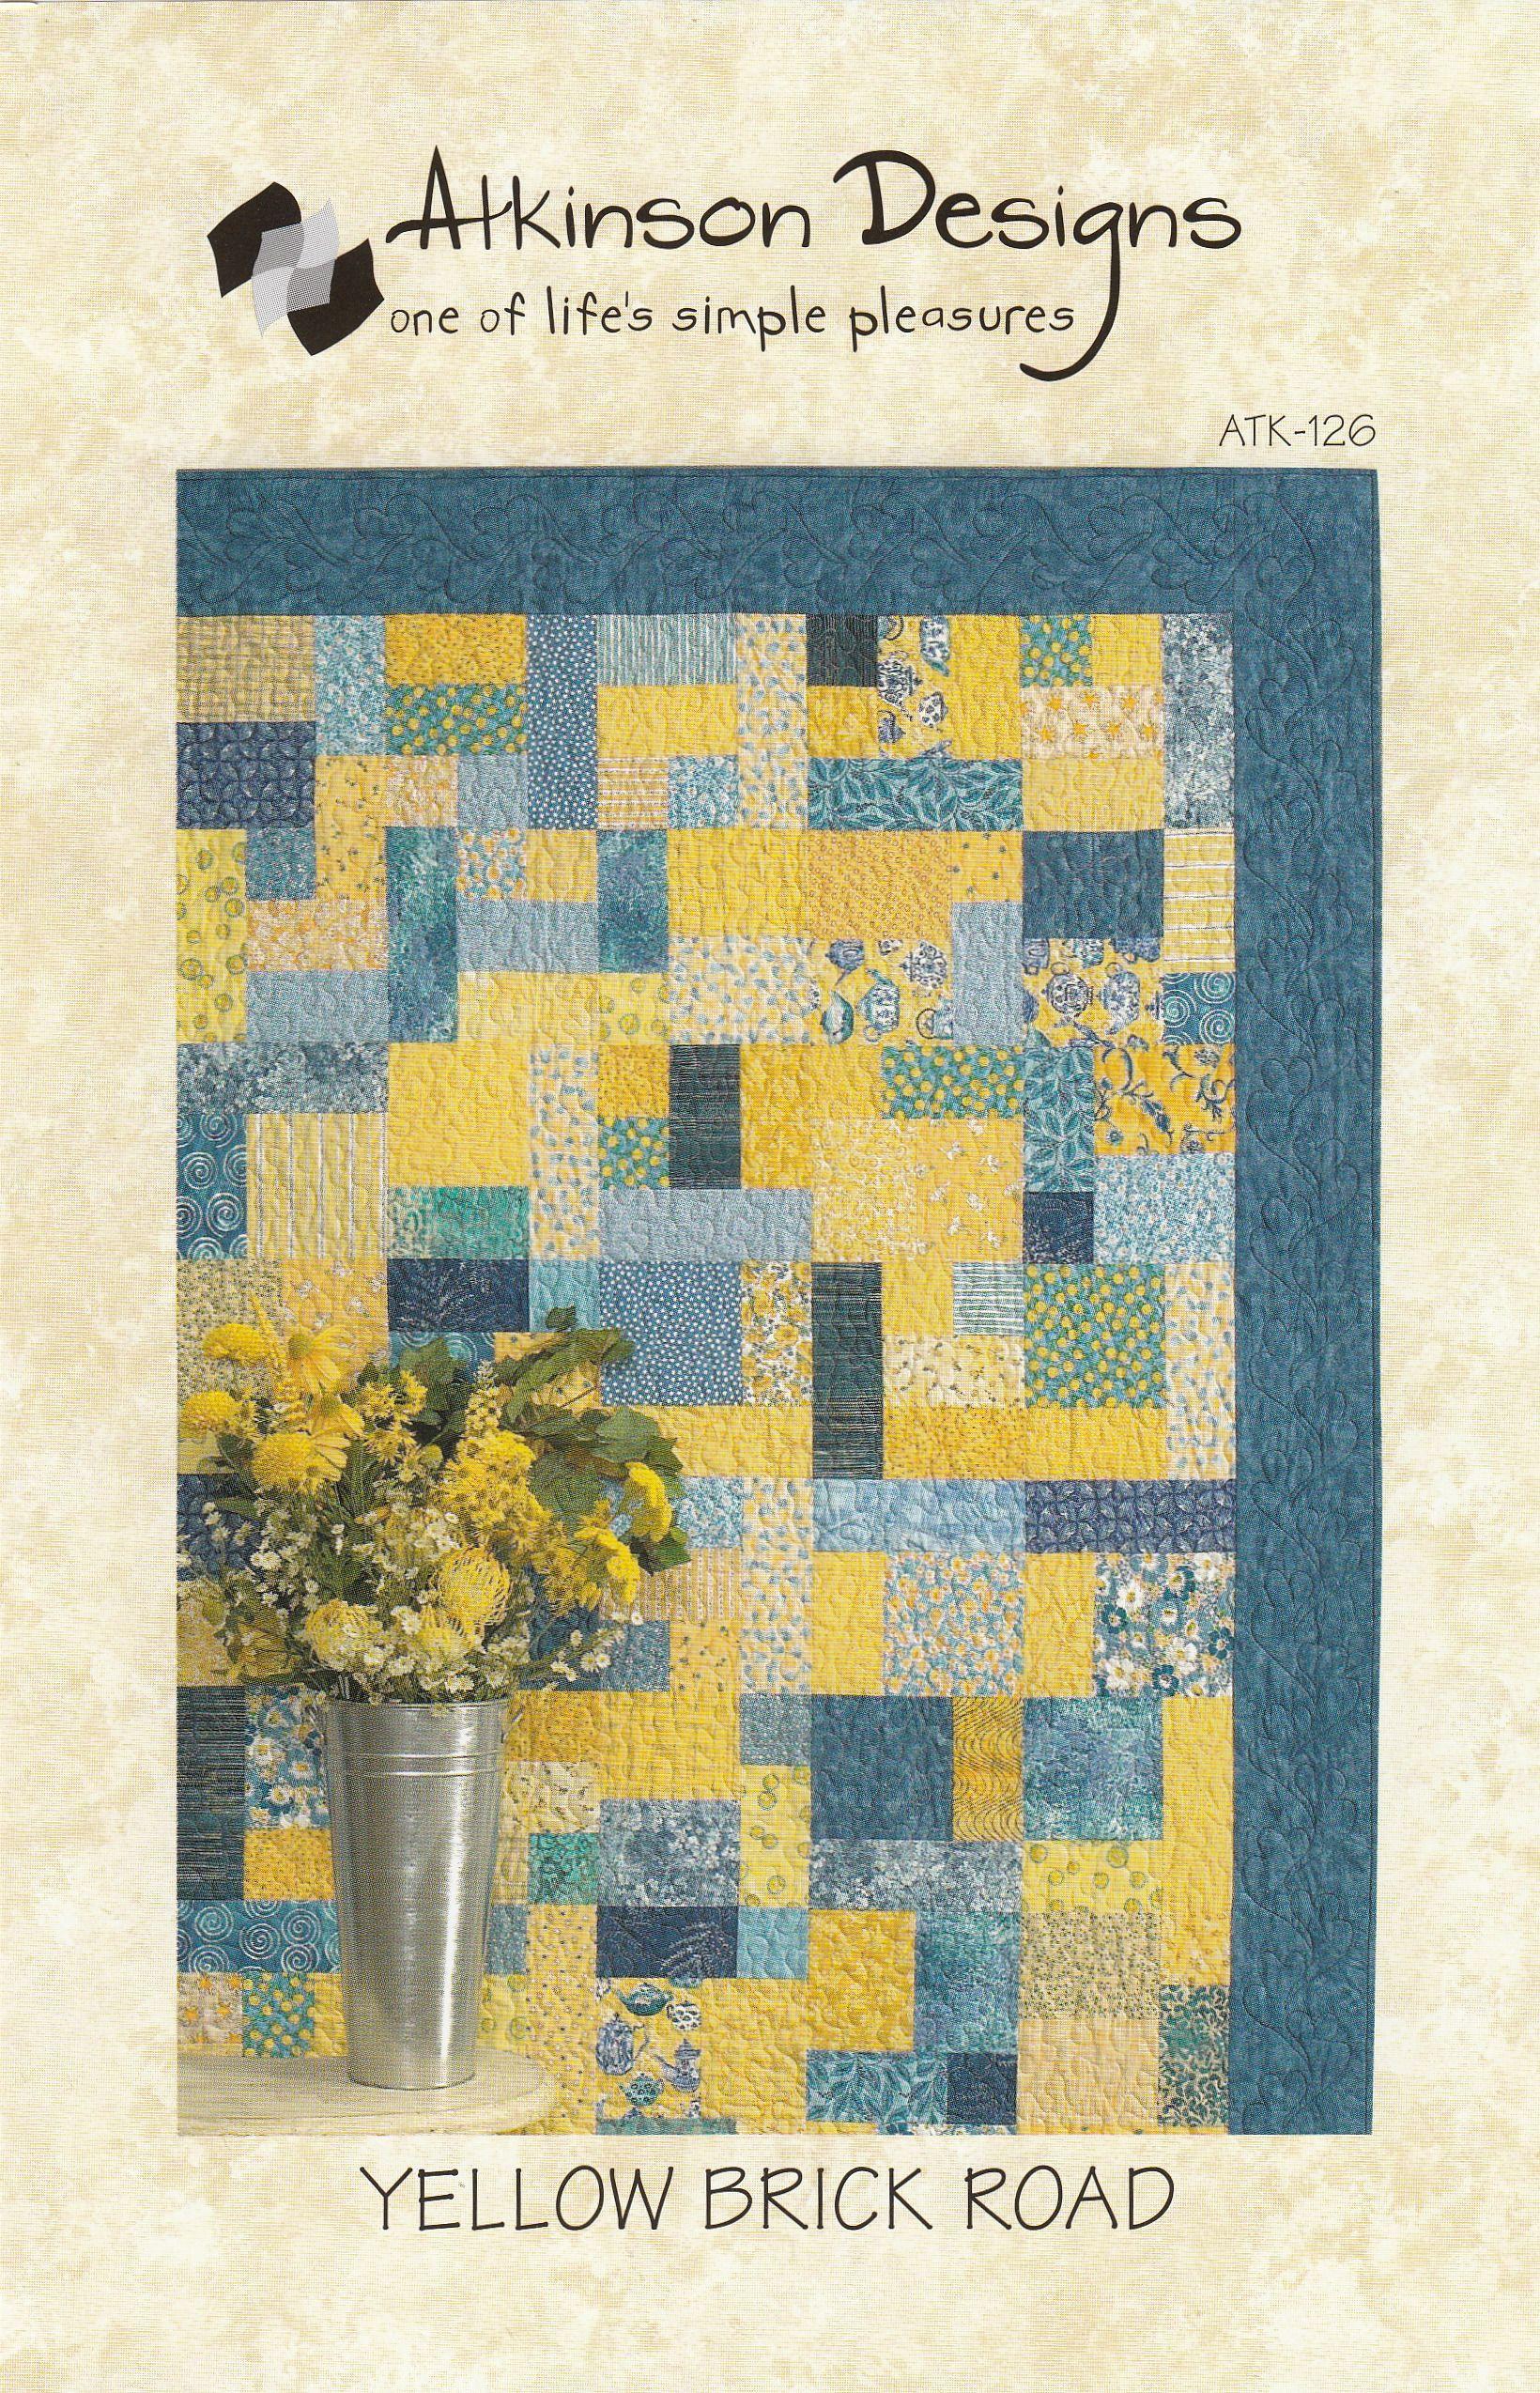 2010 Circlelord Quilt Show Quilt Patterns Free Quilts Quilt Patterns